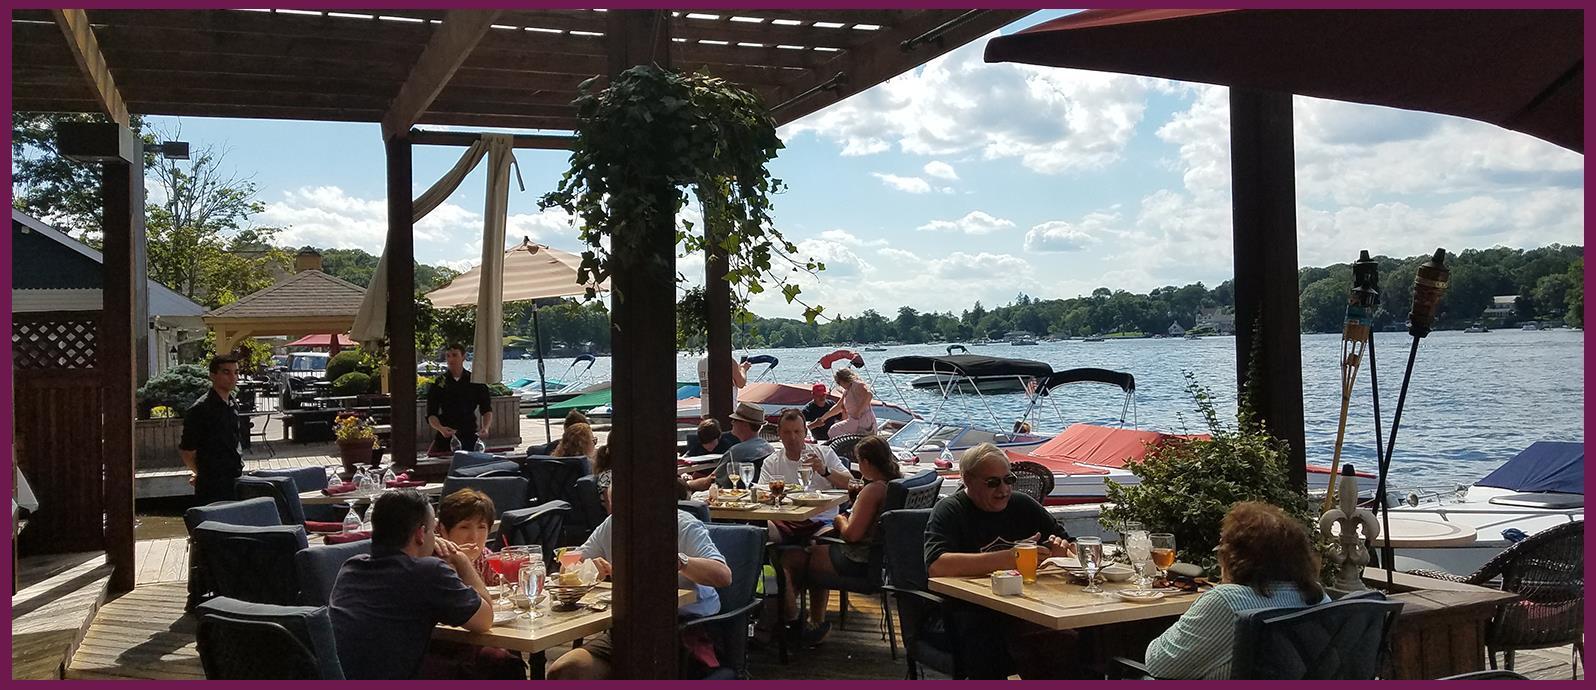 Lake House Restaurant and Bar